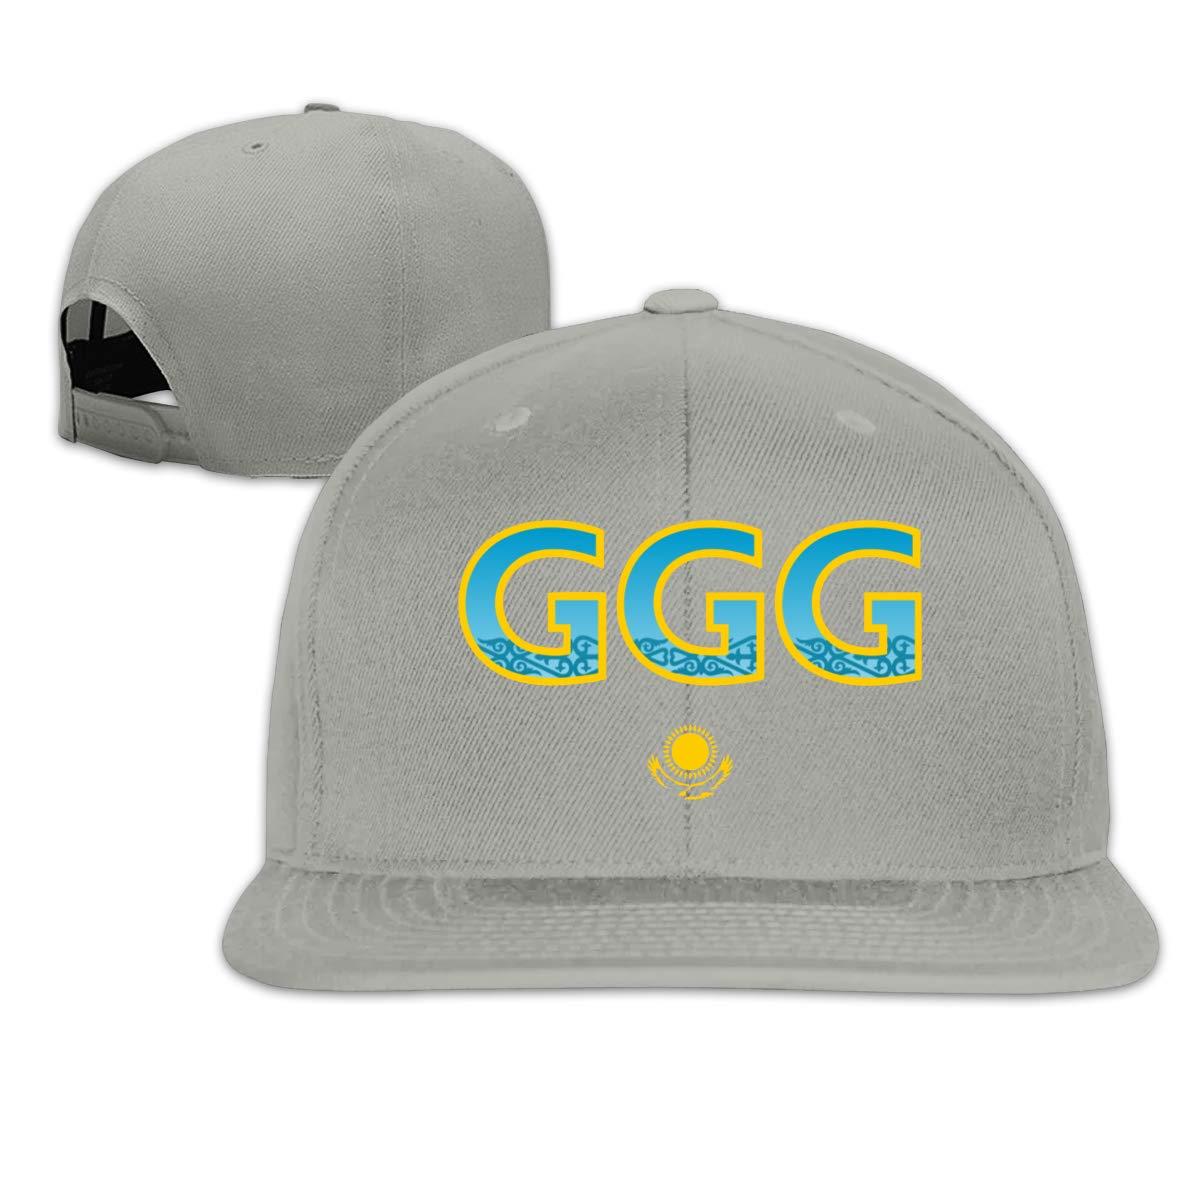 GGG Boxing Unisex Adult Hats Classic Baseball Caps Sports Hat Peaked Cap